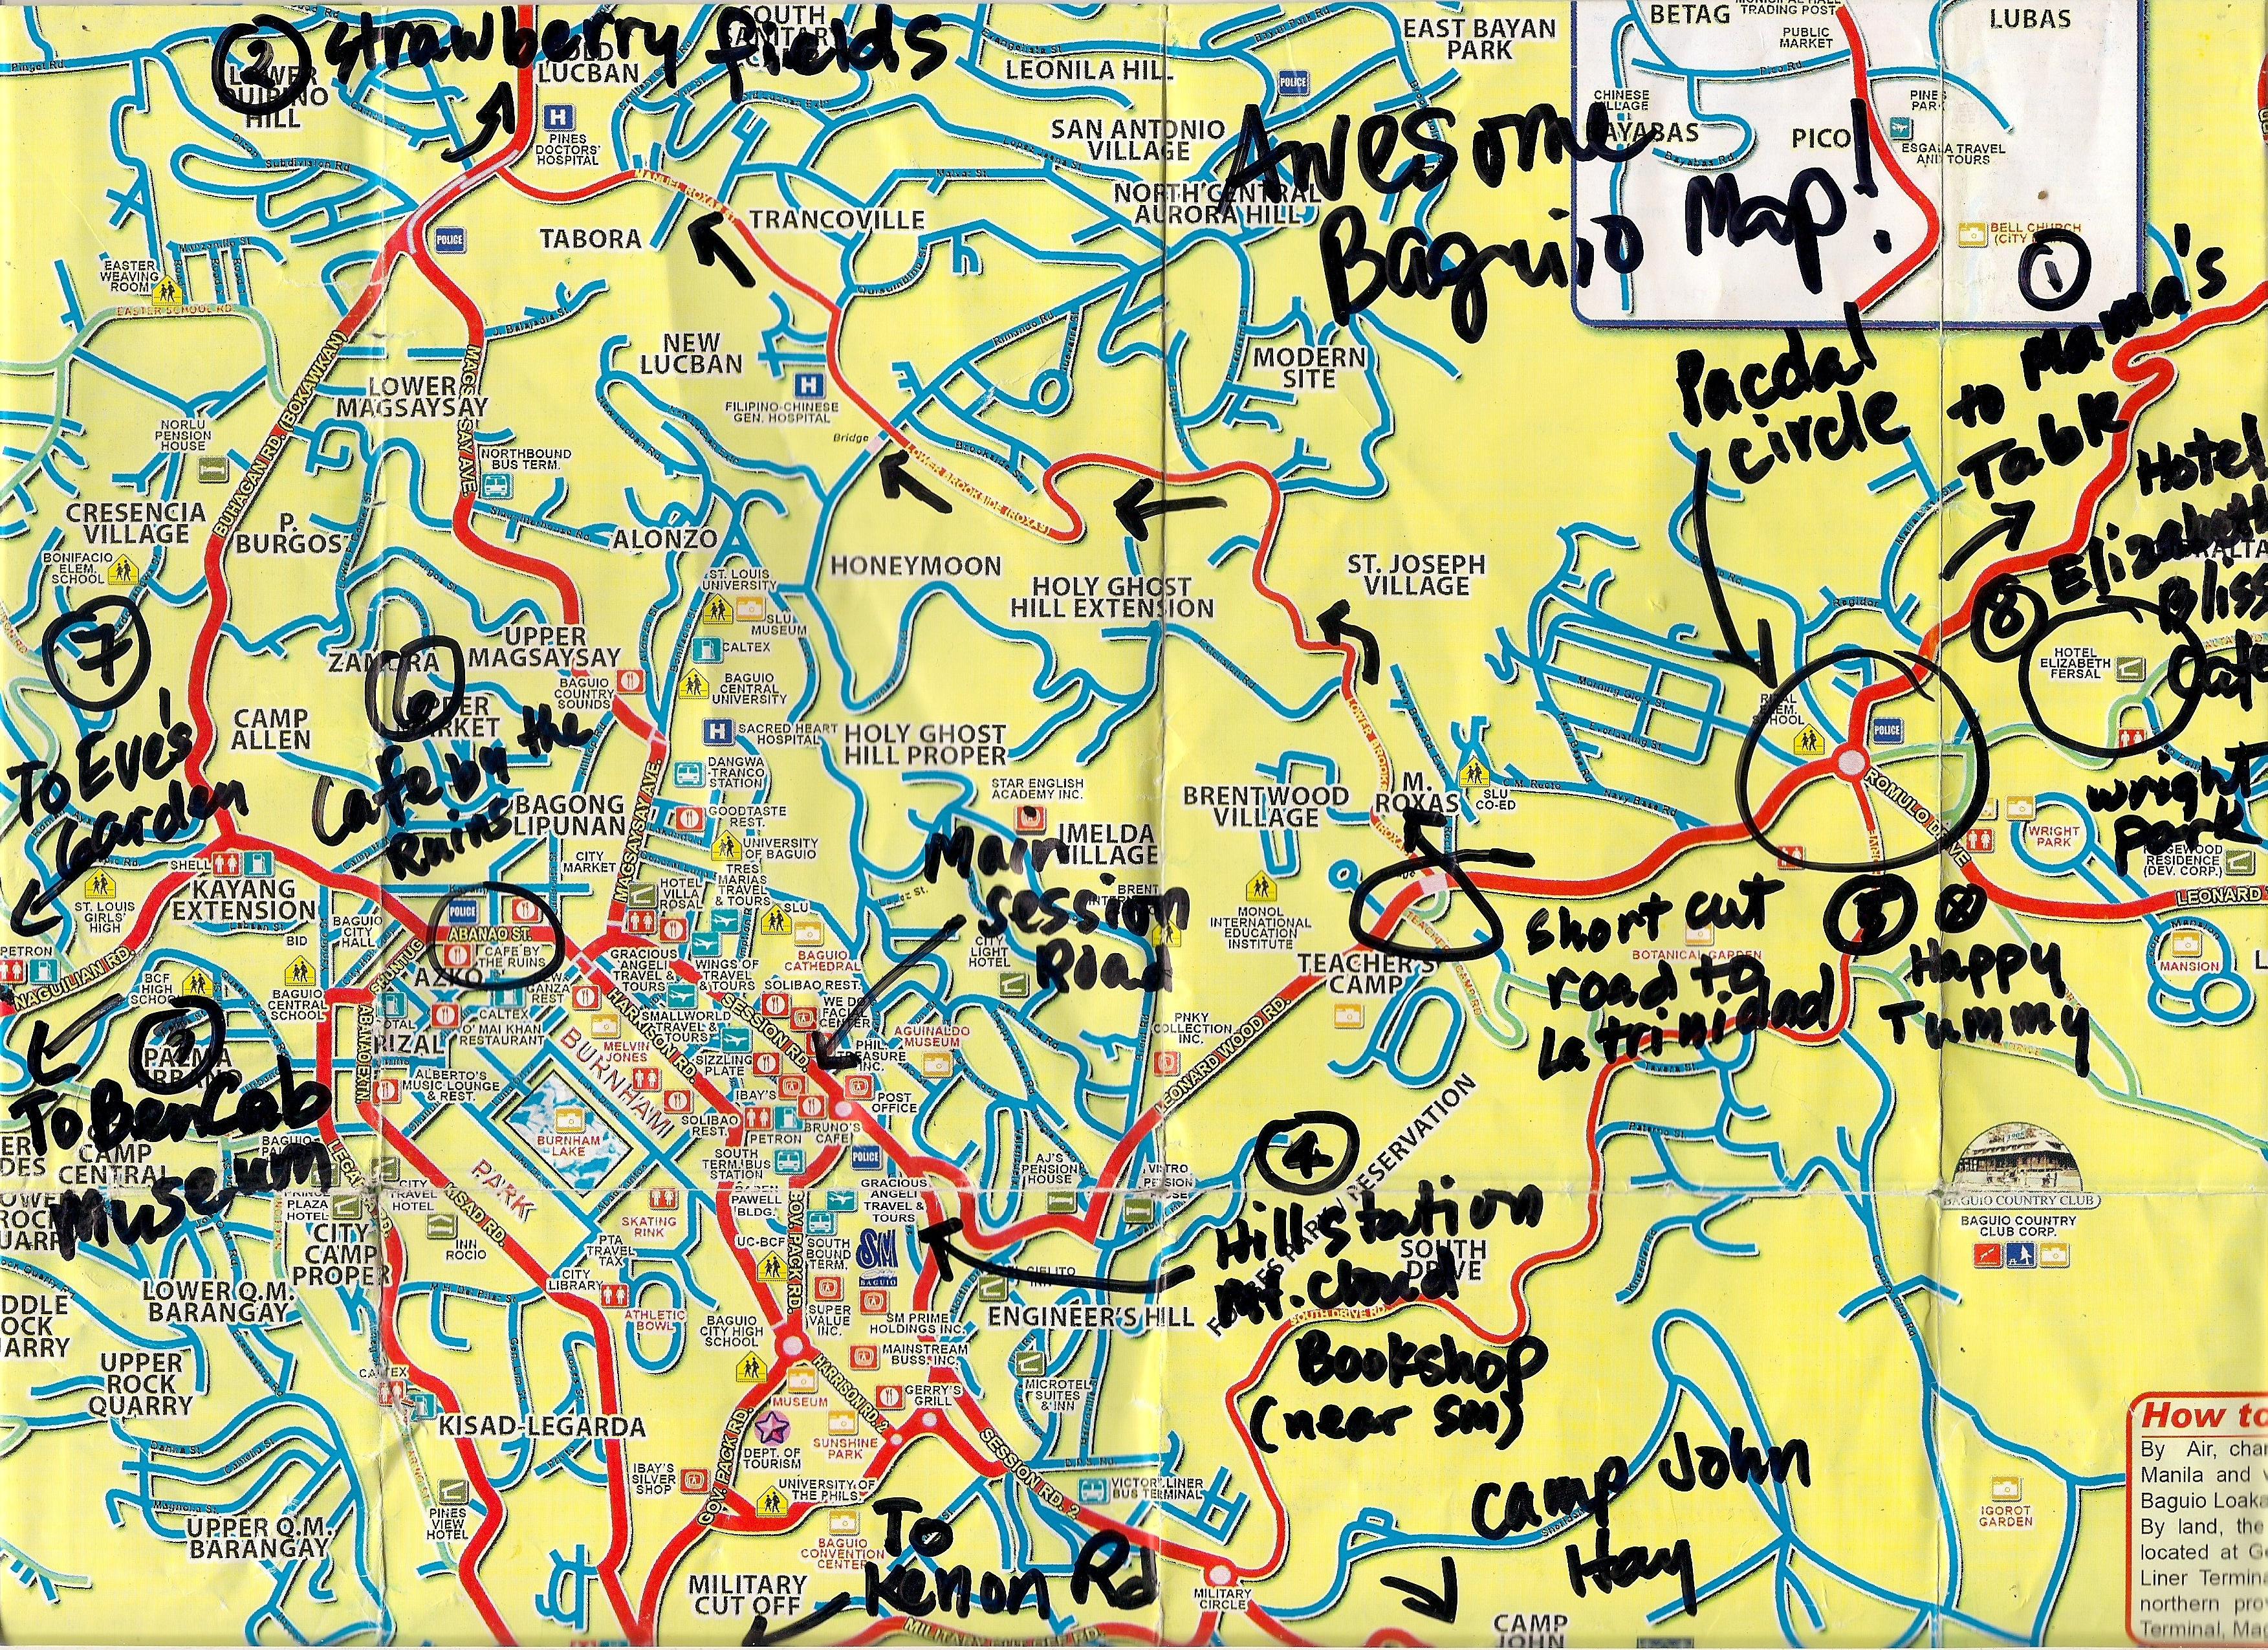 BAGUIO MAP WITH TOURIST SPOTS PDF DOWNLOAD